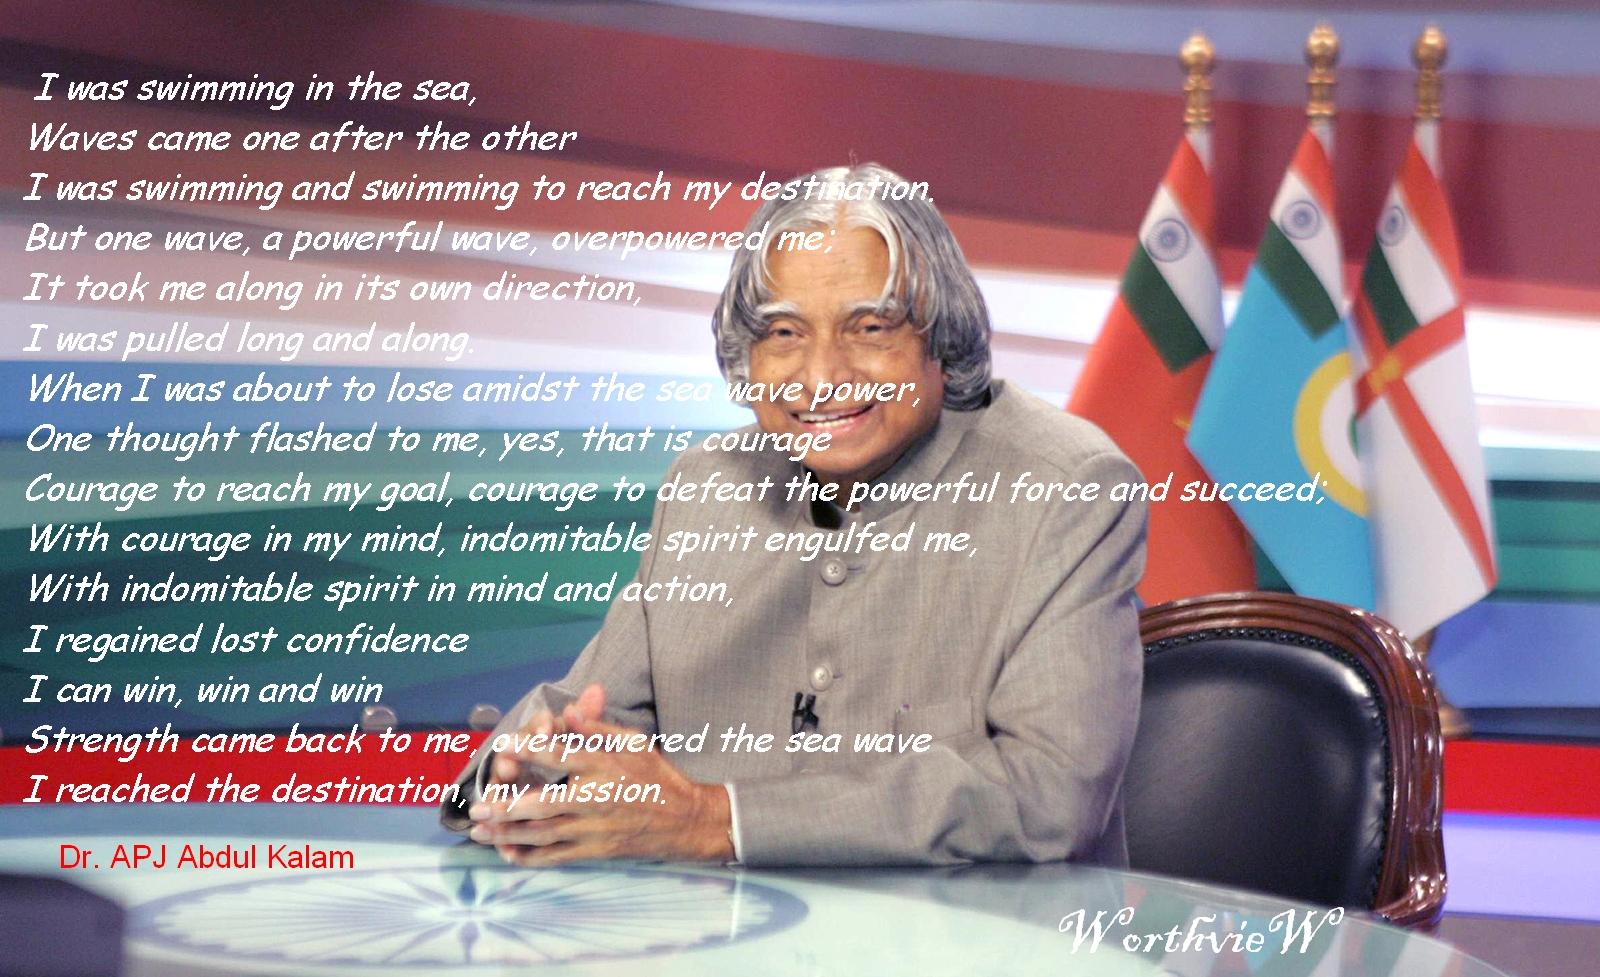 Indomitable Spirit By Dr Apj Abdul Kalam Worthview